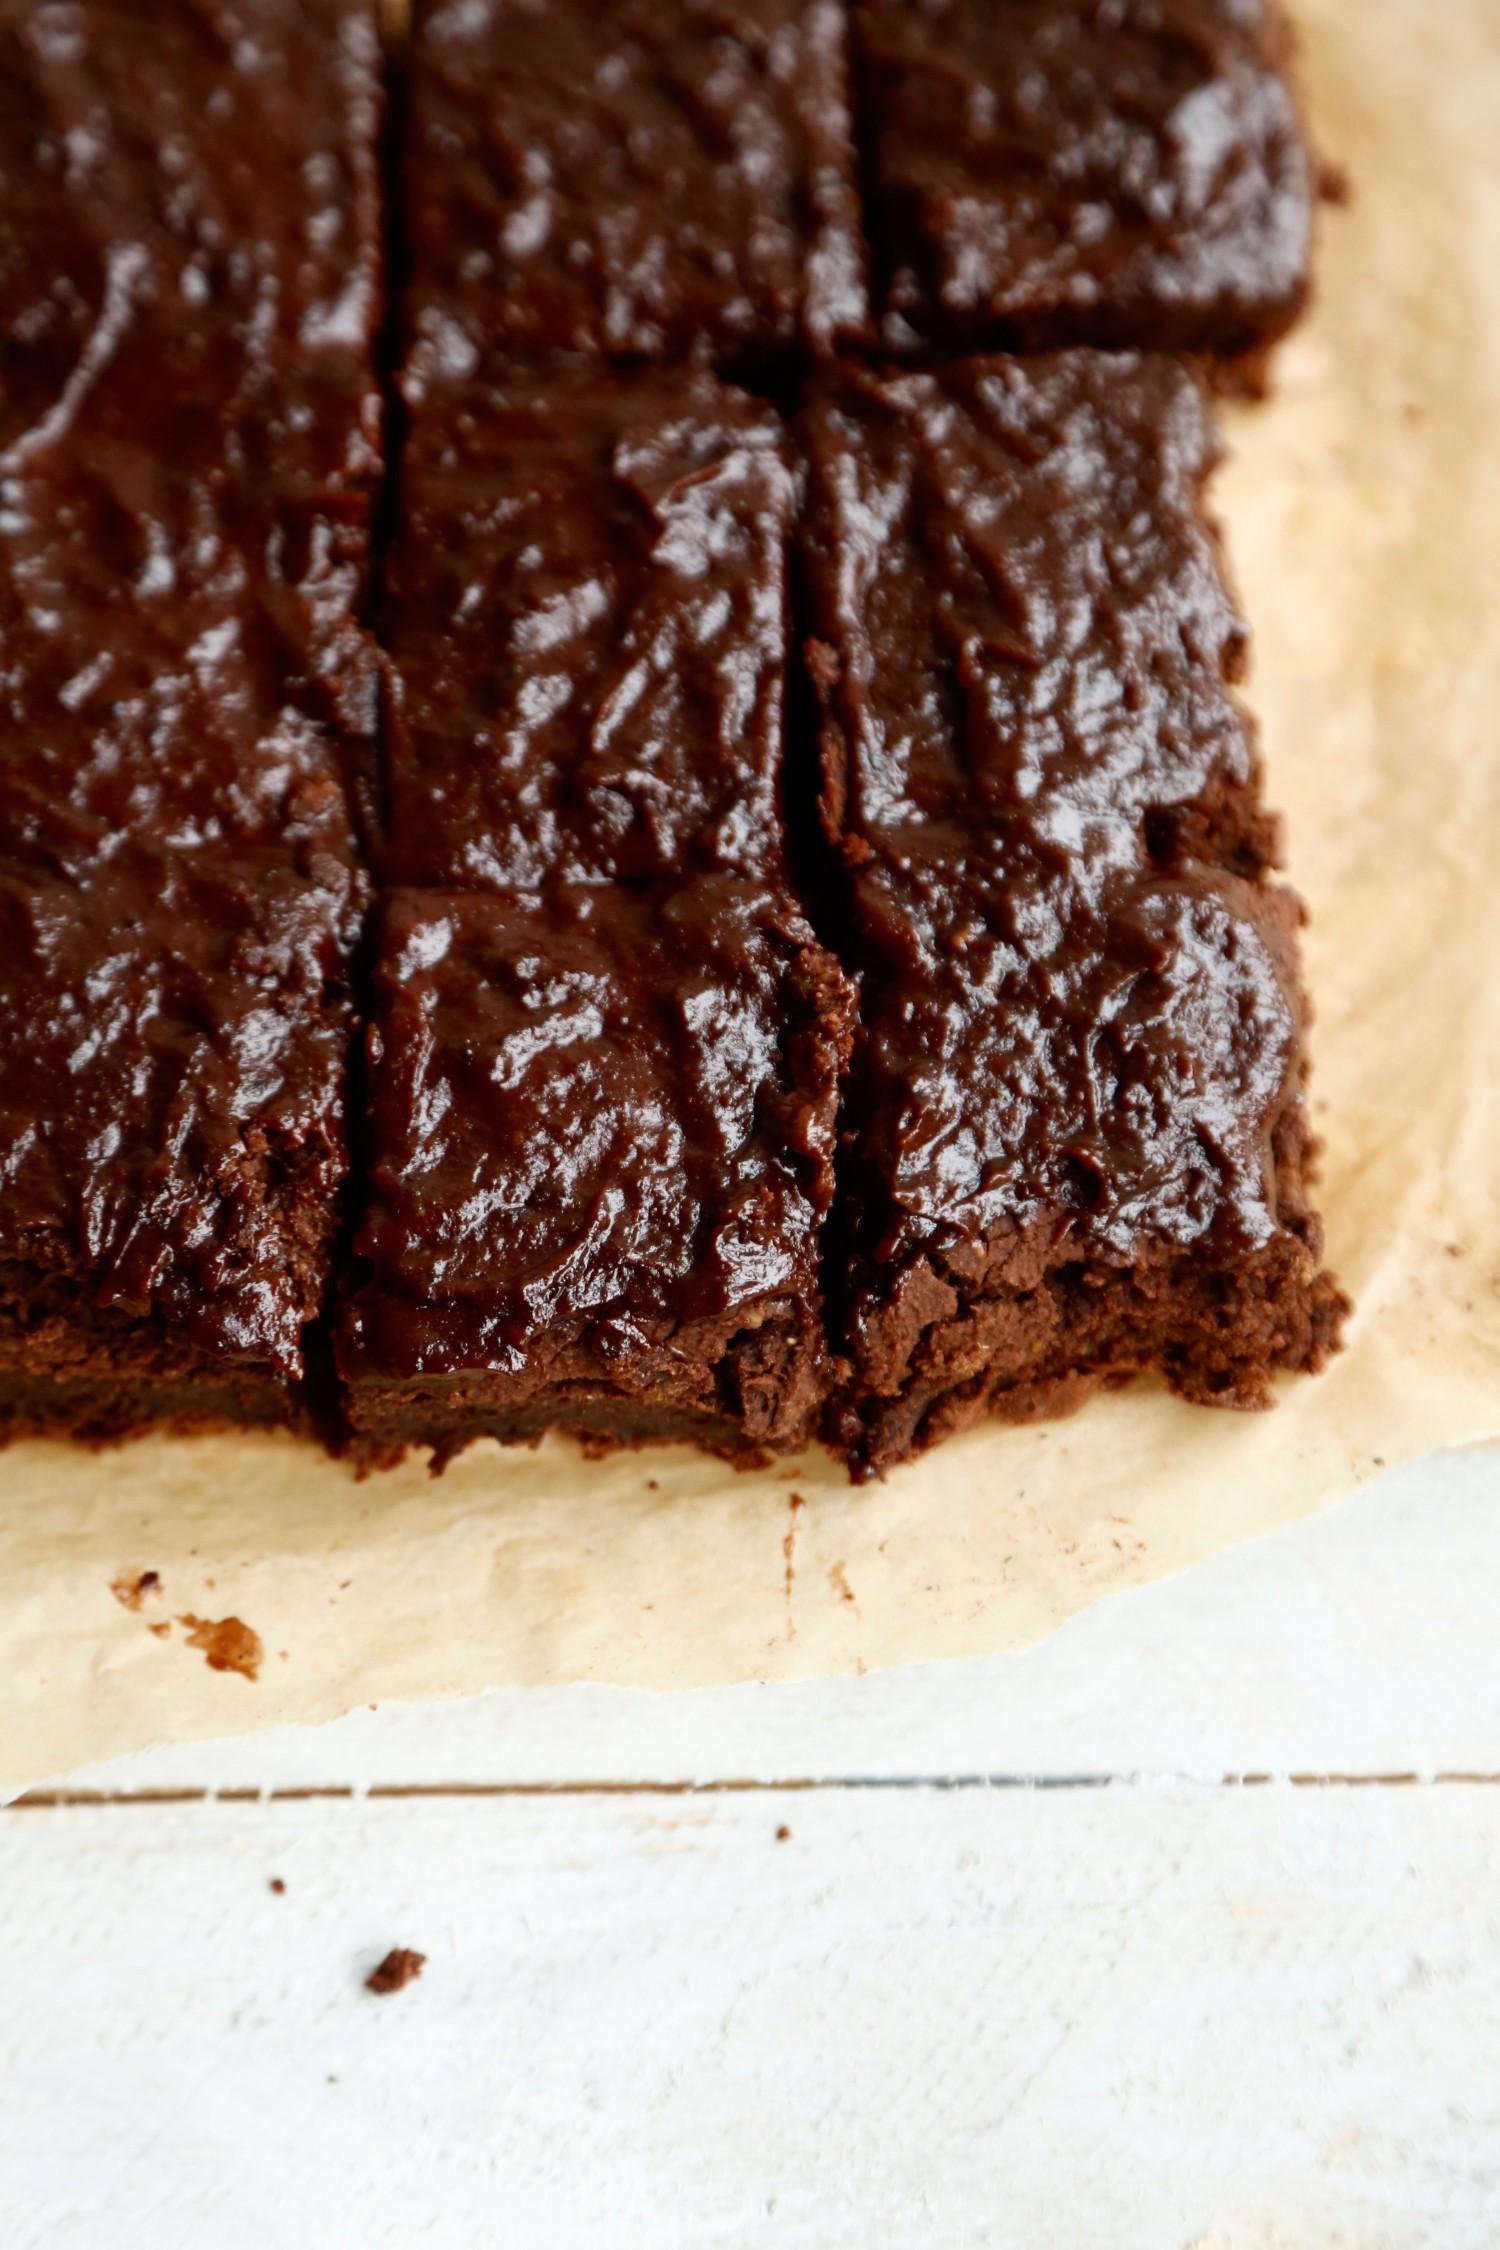 opskrift-laekker-chokoladebrownie-med-kikaerter-2